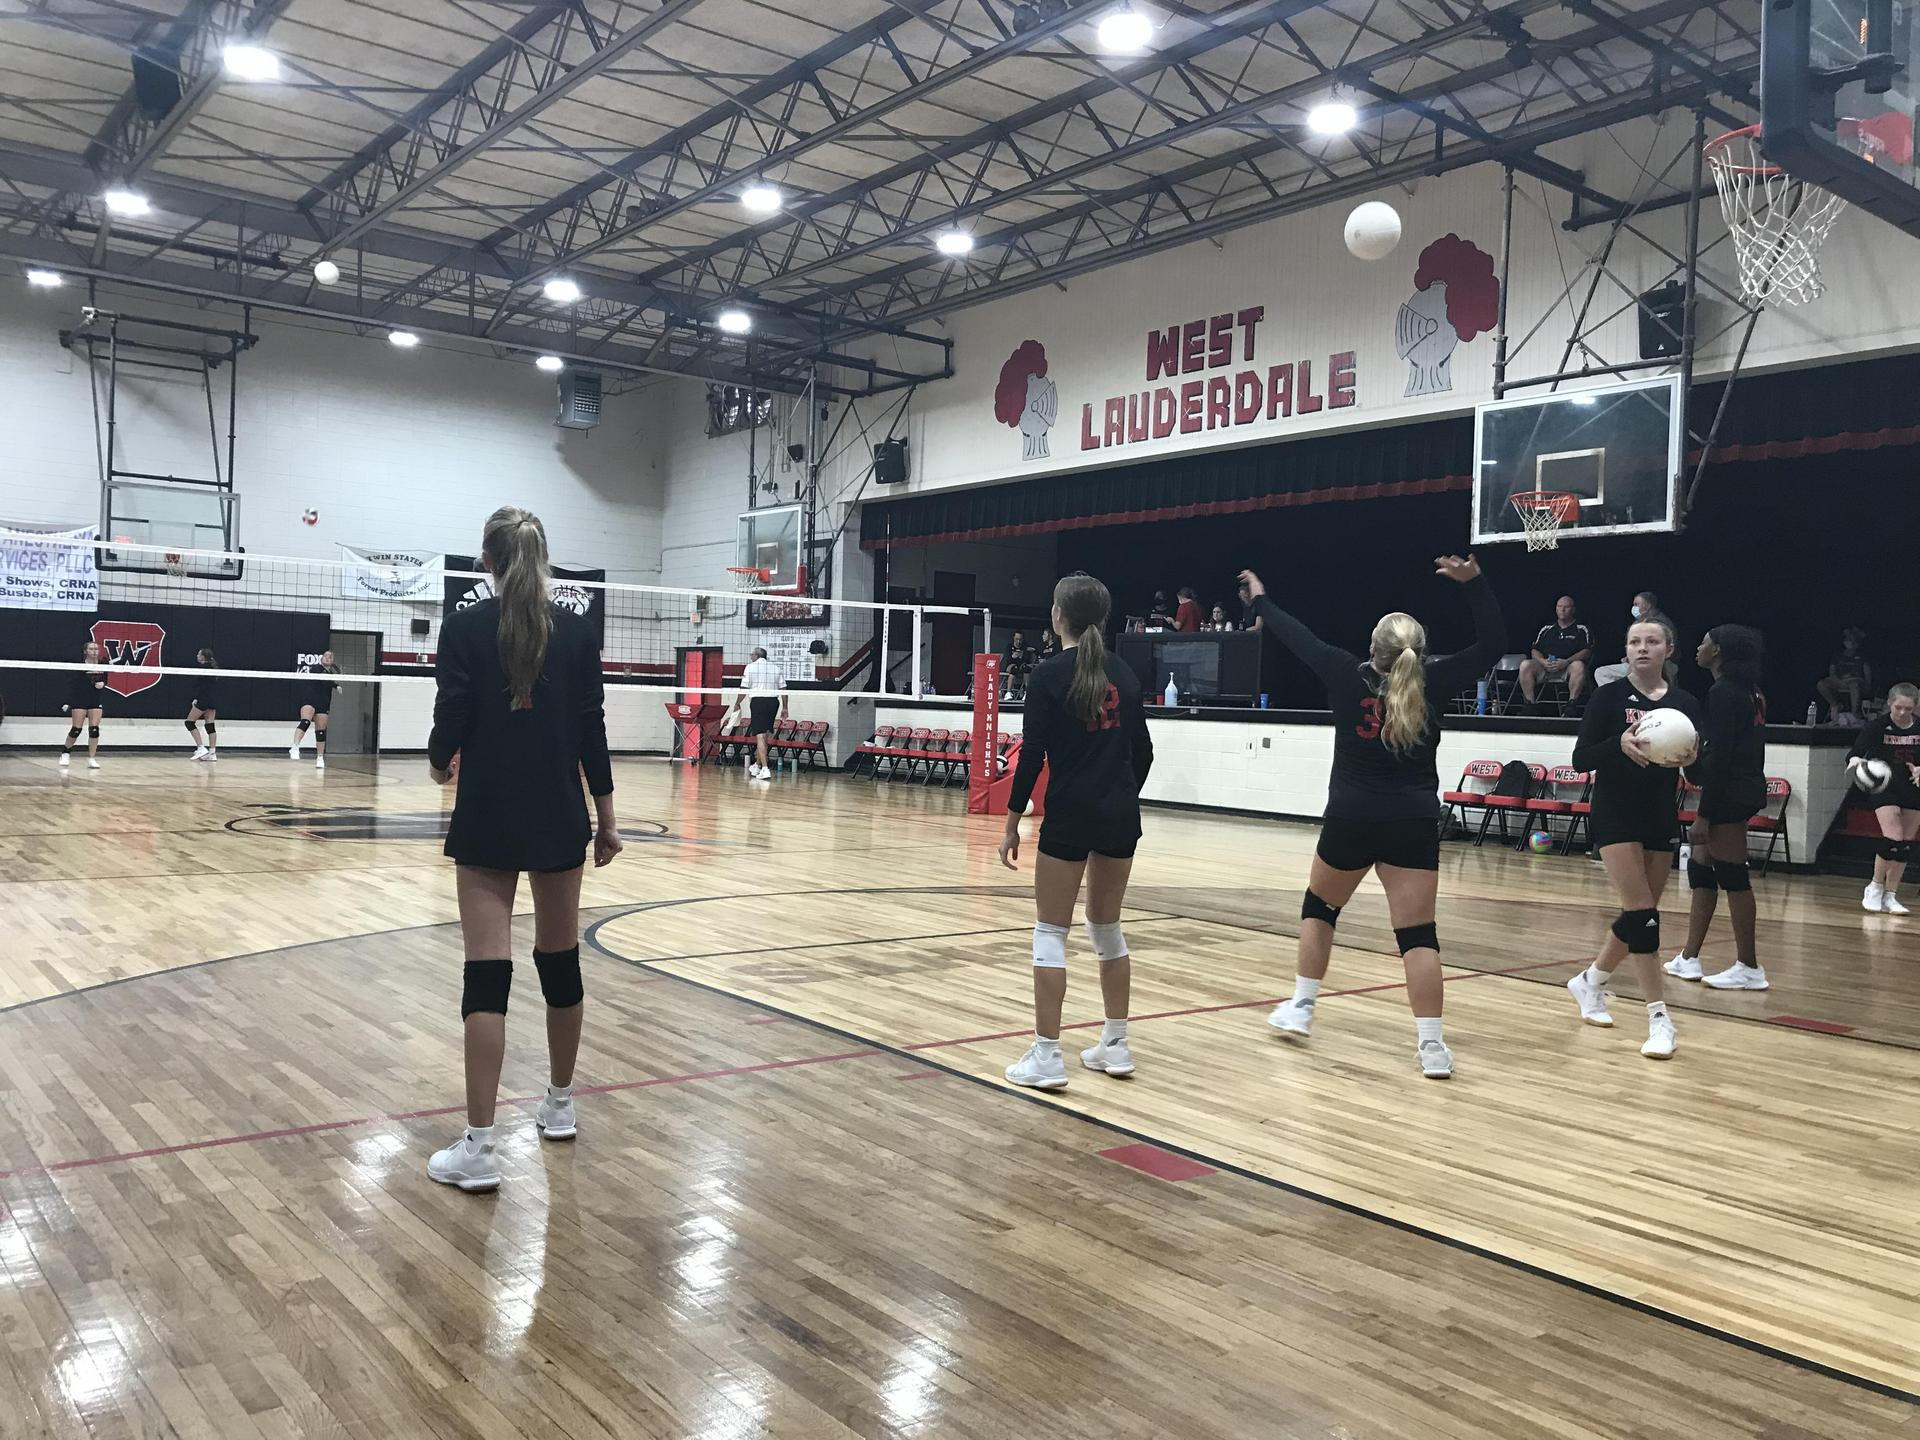 West Lauderdale High School Volleyball Team